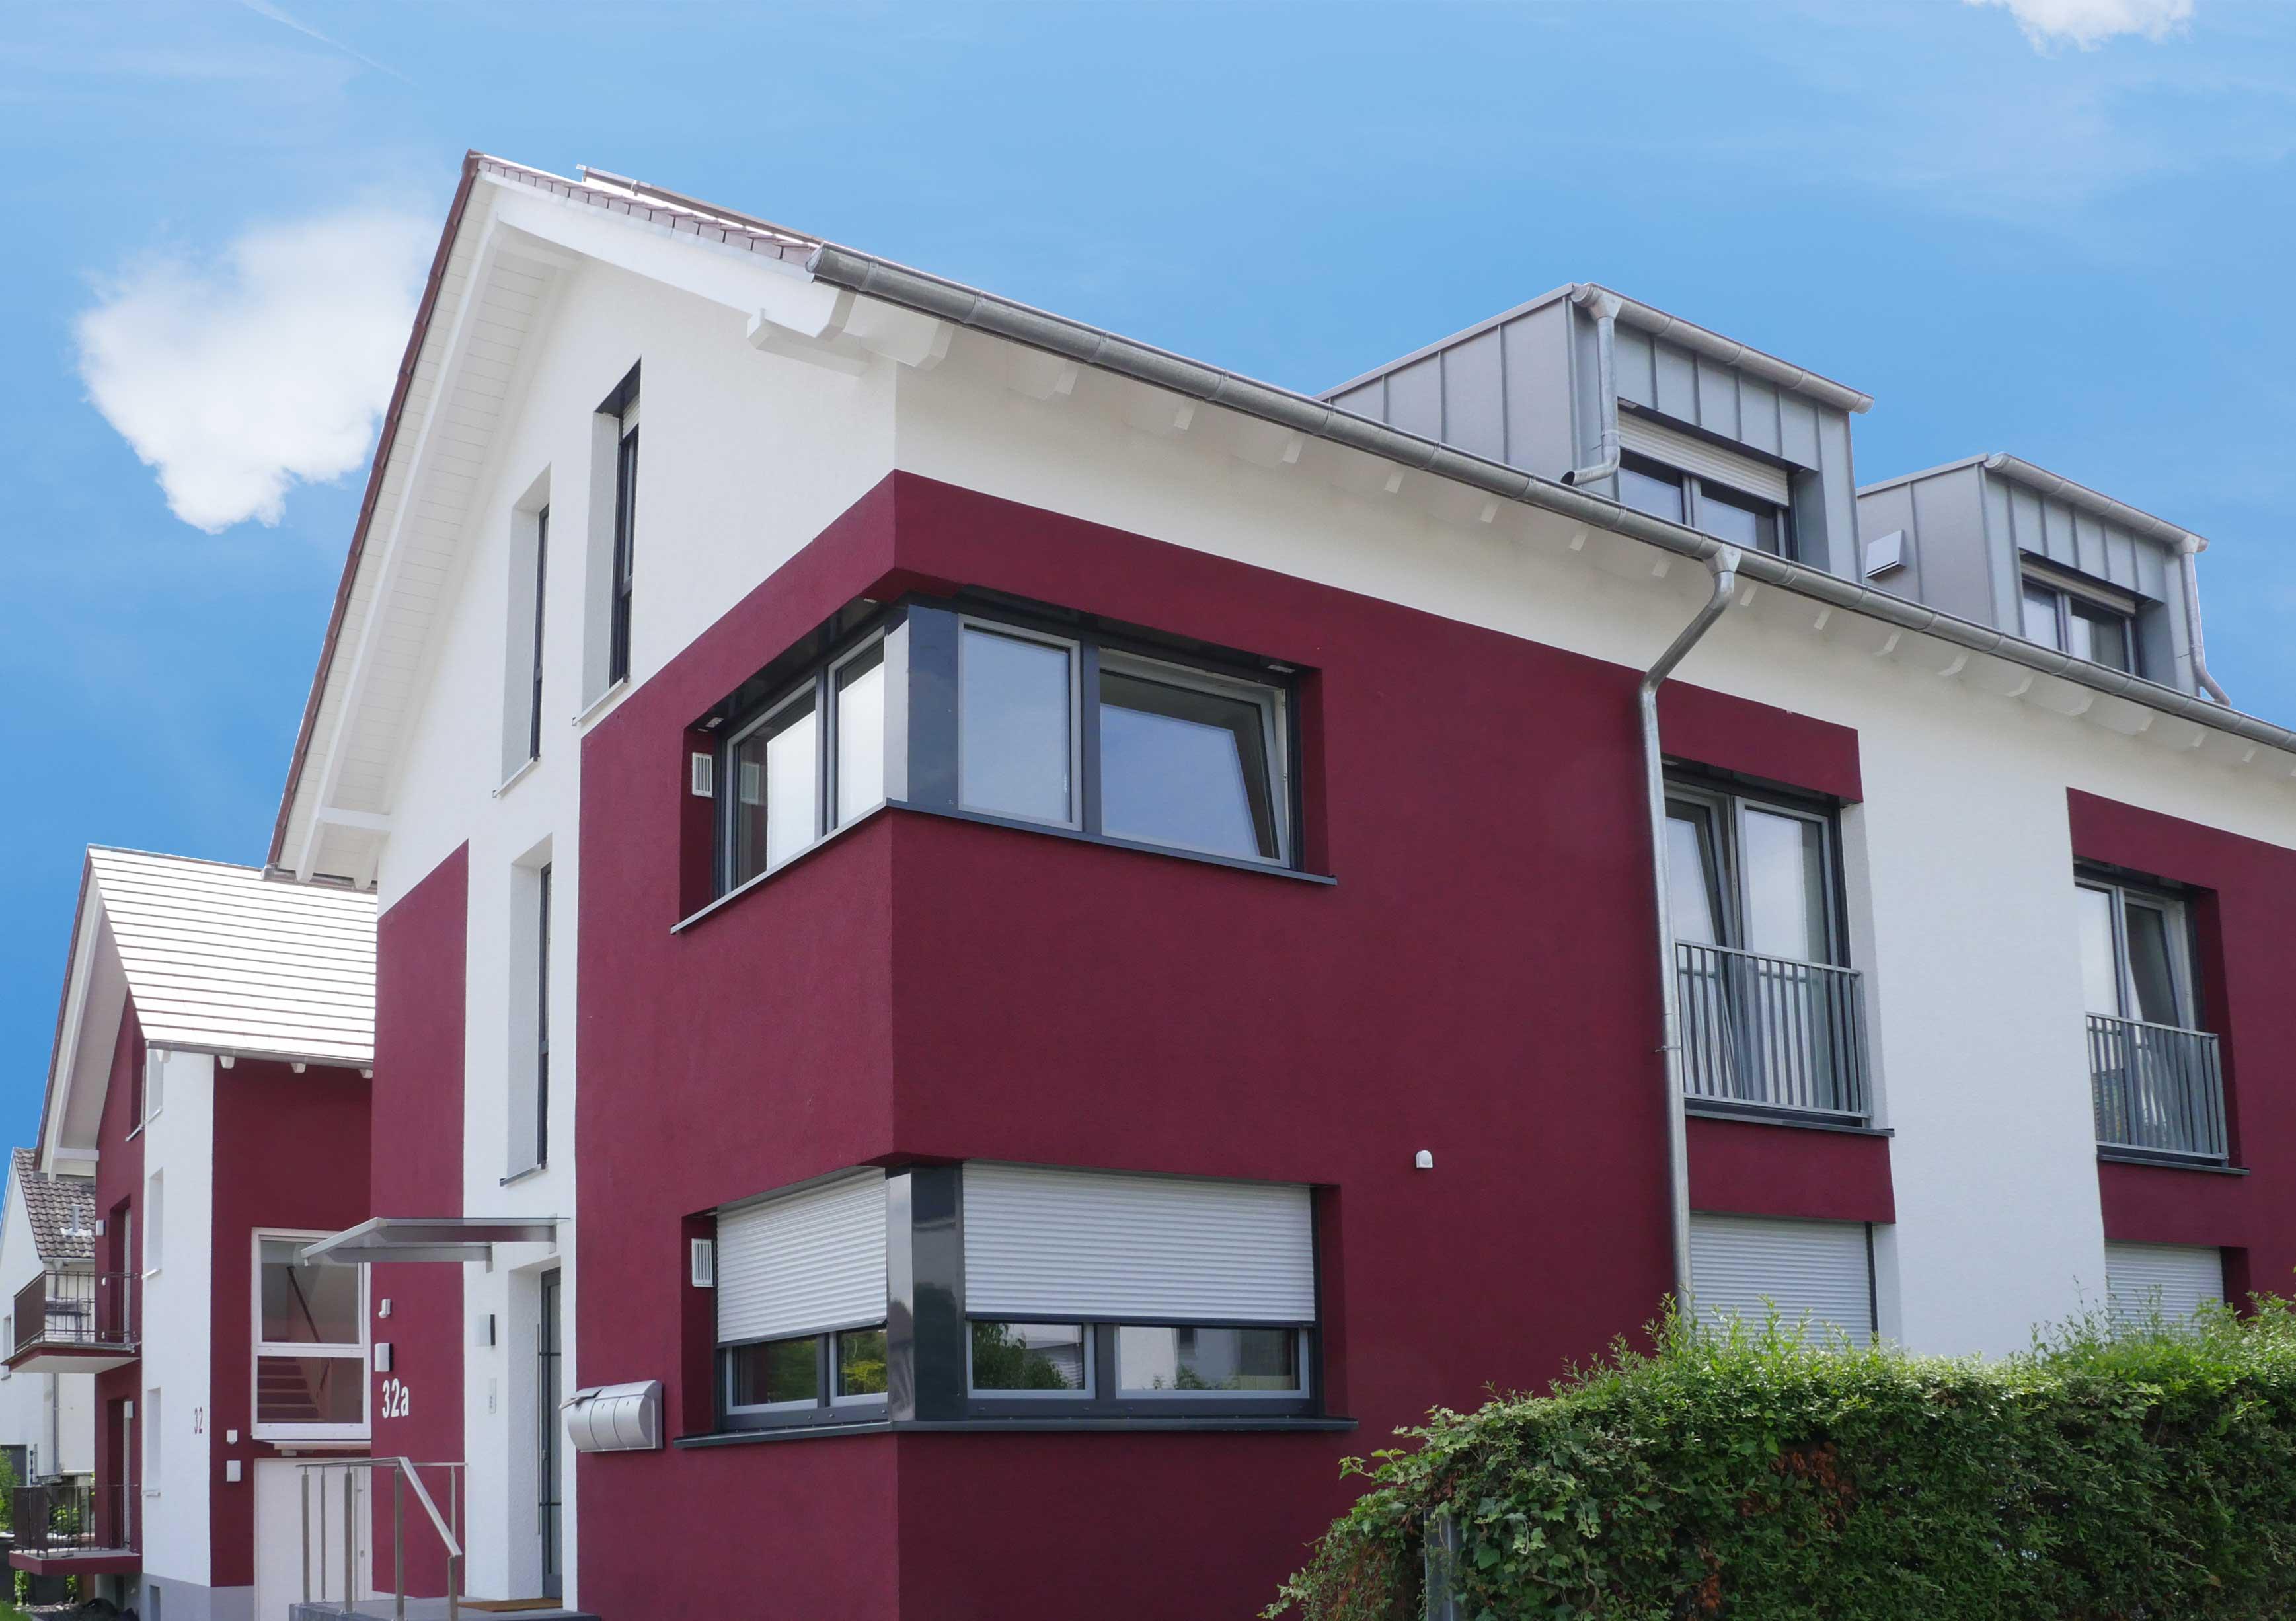 KfW-Effizienzhaus 40 Plus, Liederbach, #KfW